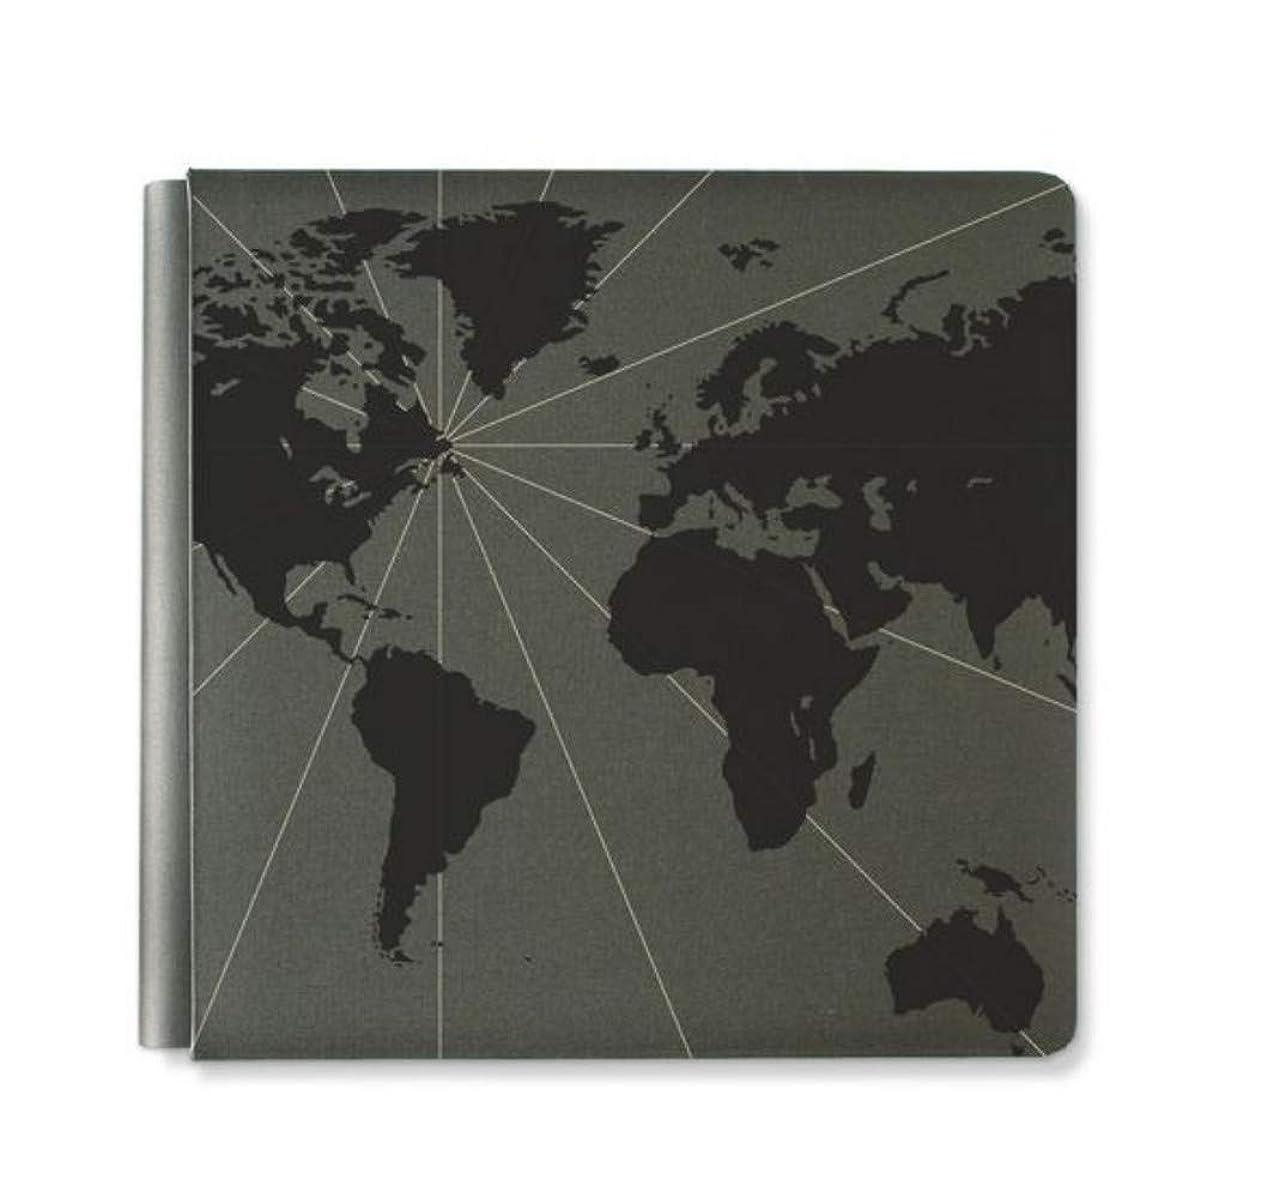 Creative Memories Black Forest Travel Log Album Scrapbook Cover 12x12 True Size